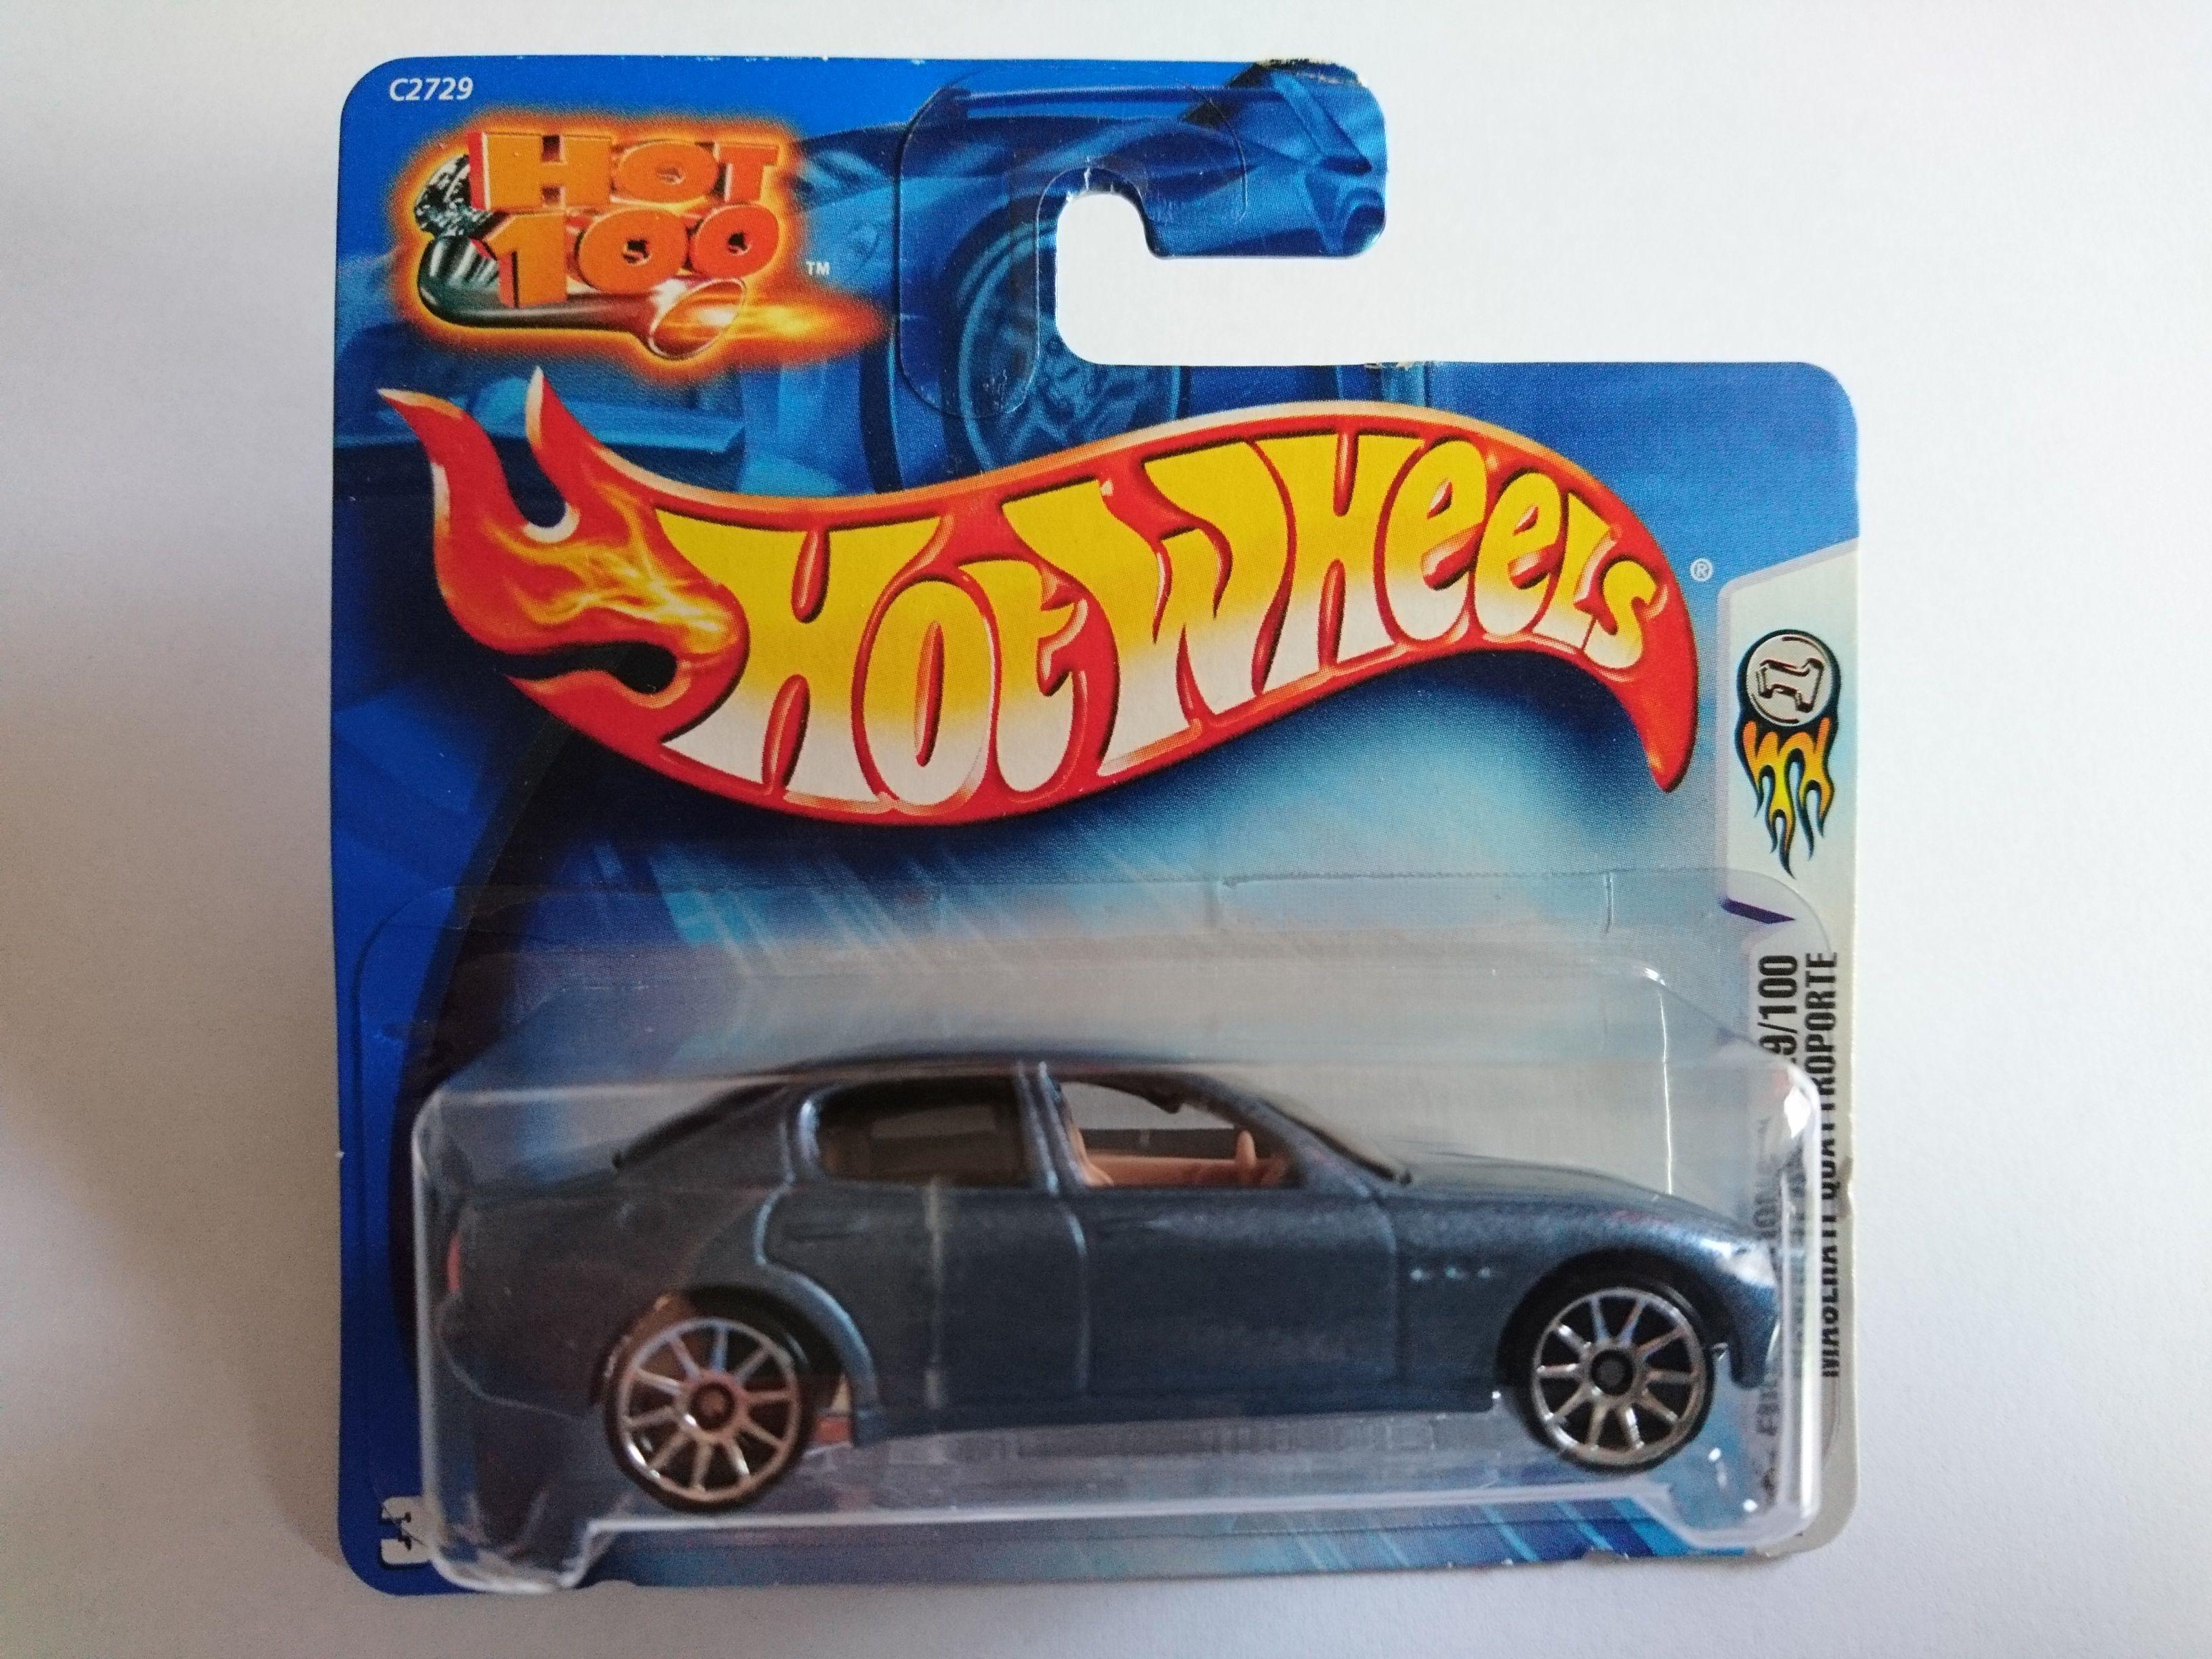 2004 - MASERATI Quattroporte (Hot Wheels)